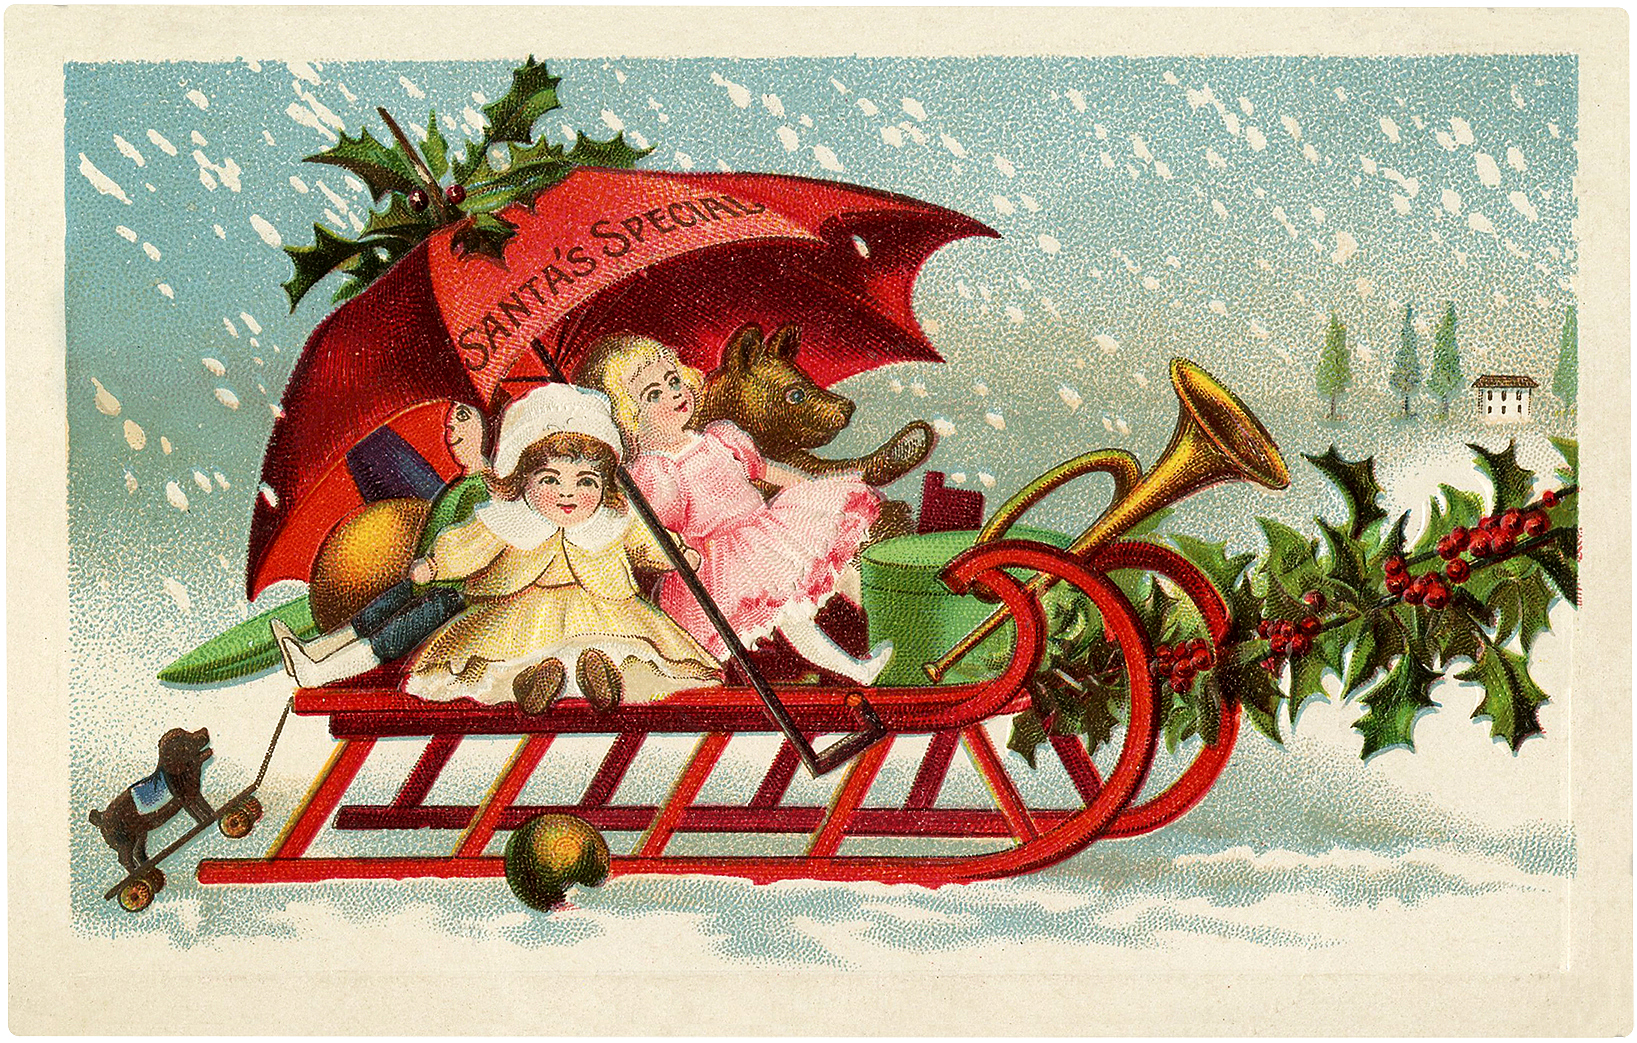 Christmas Sled Toys Image